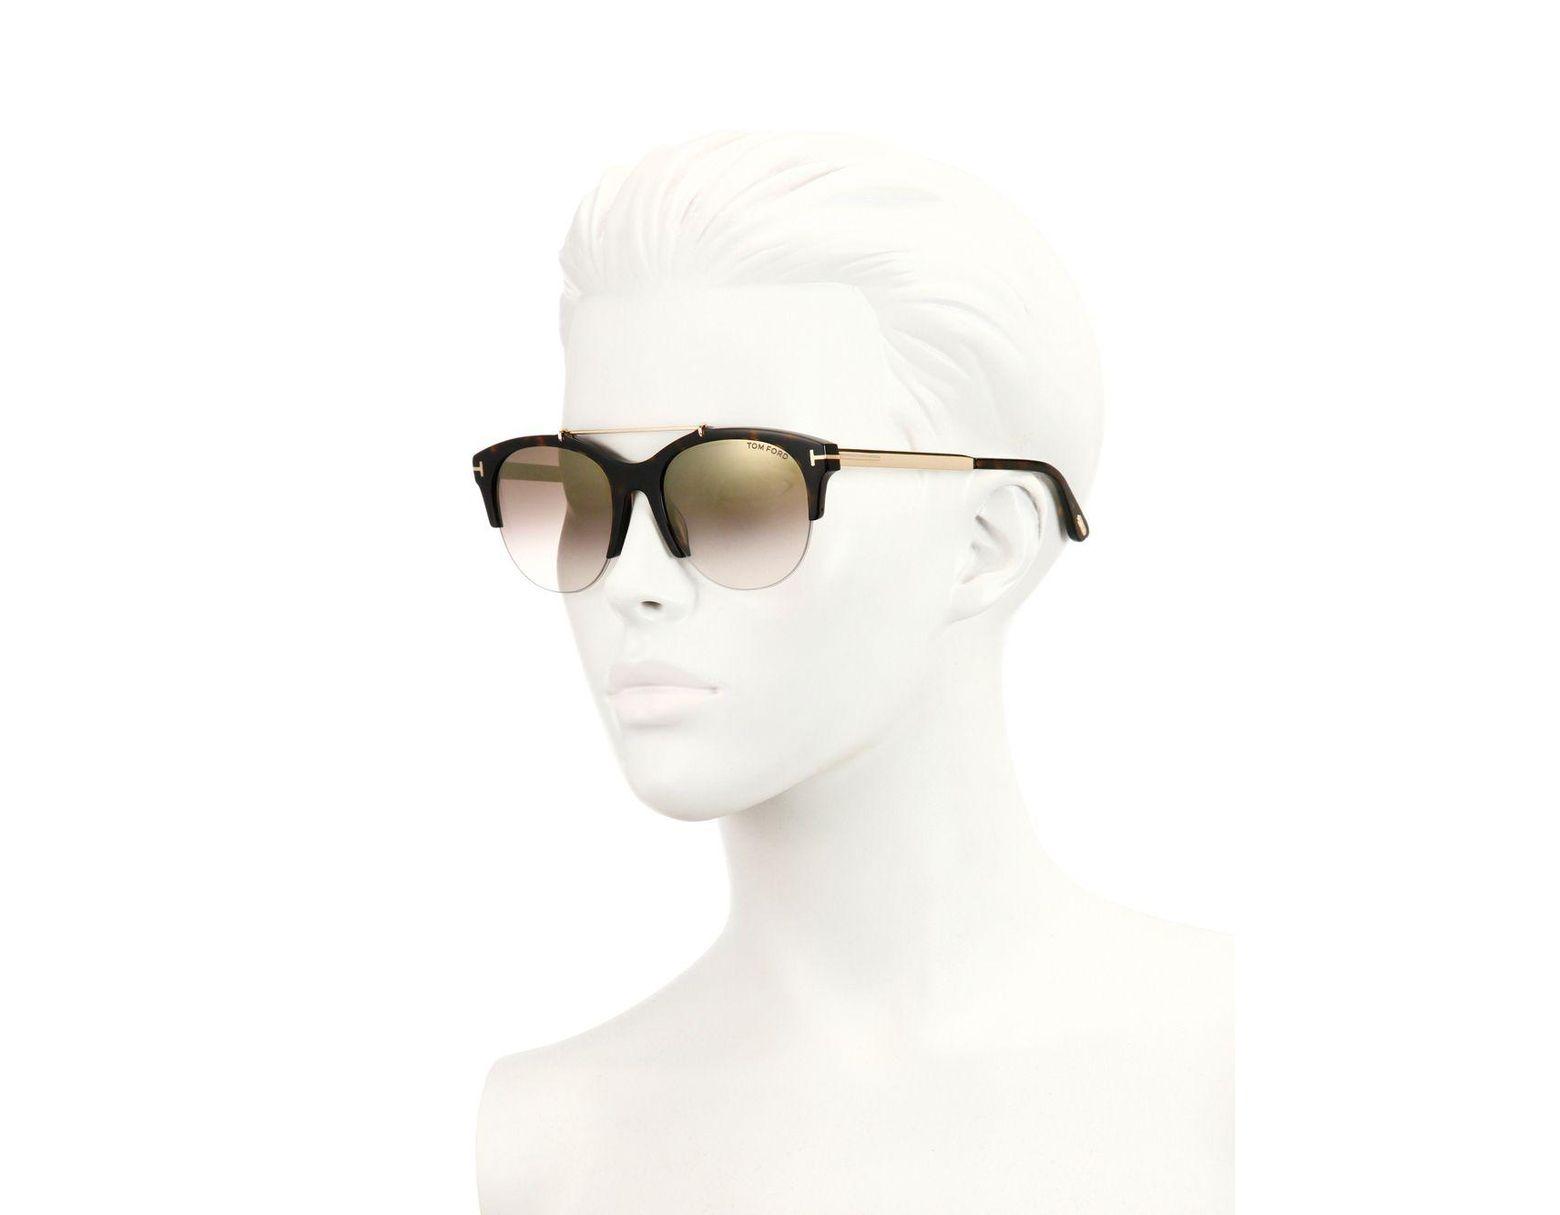 84dfbdd43b215 Tom Ford Adrenne 55mm Mirrored Round Sunglasses in Brown - Lyst